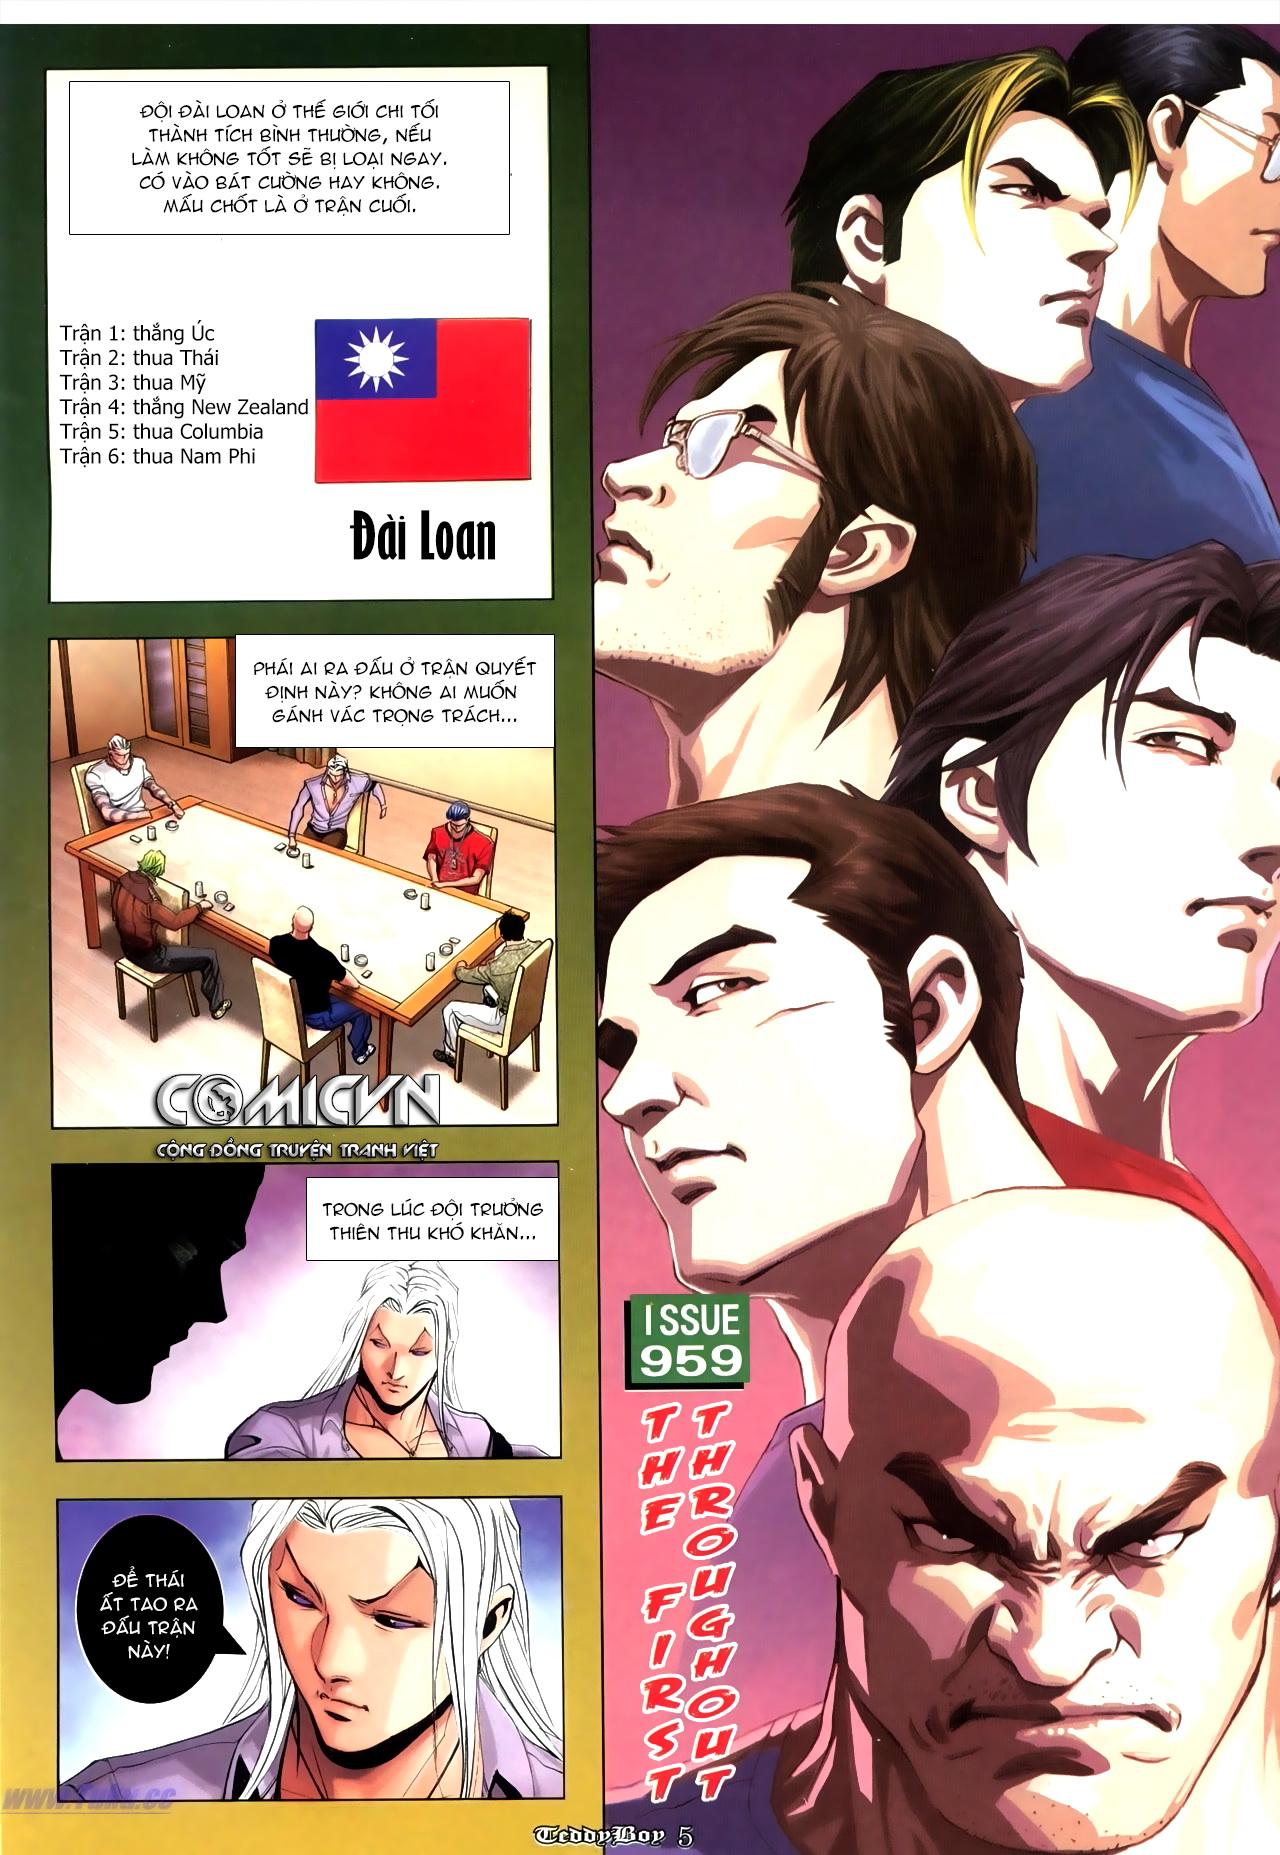 Người Trong Giang Hồ Chap 959 - Truyen.Chap.VN